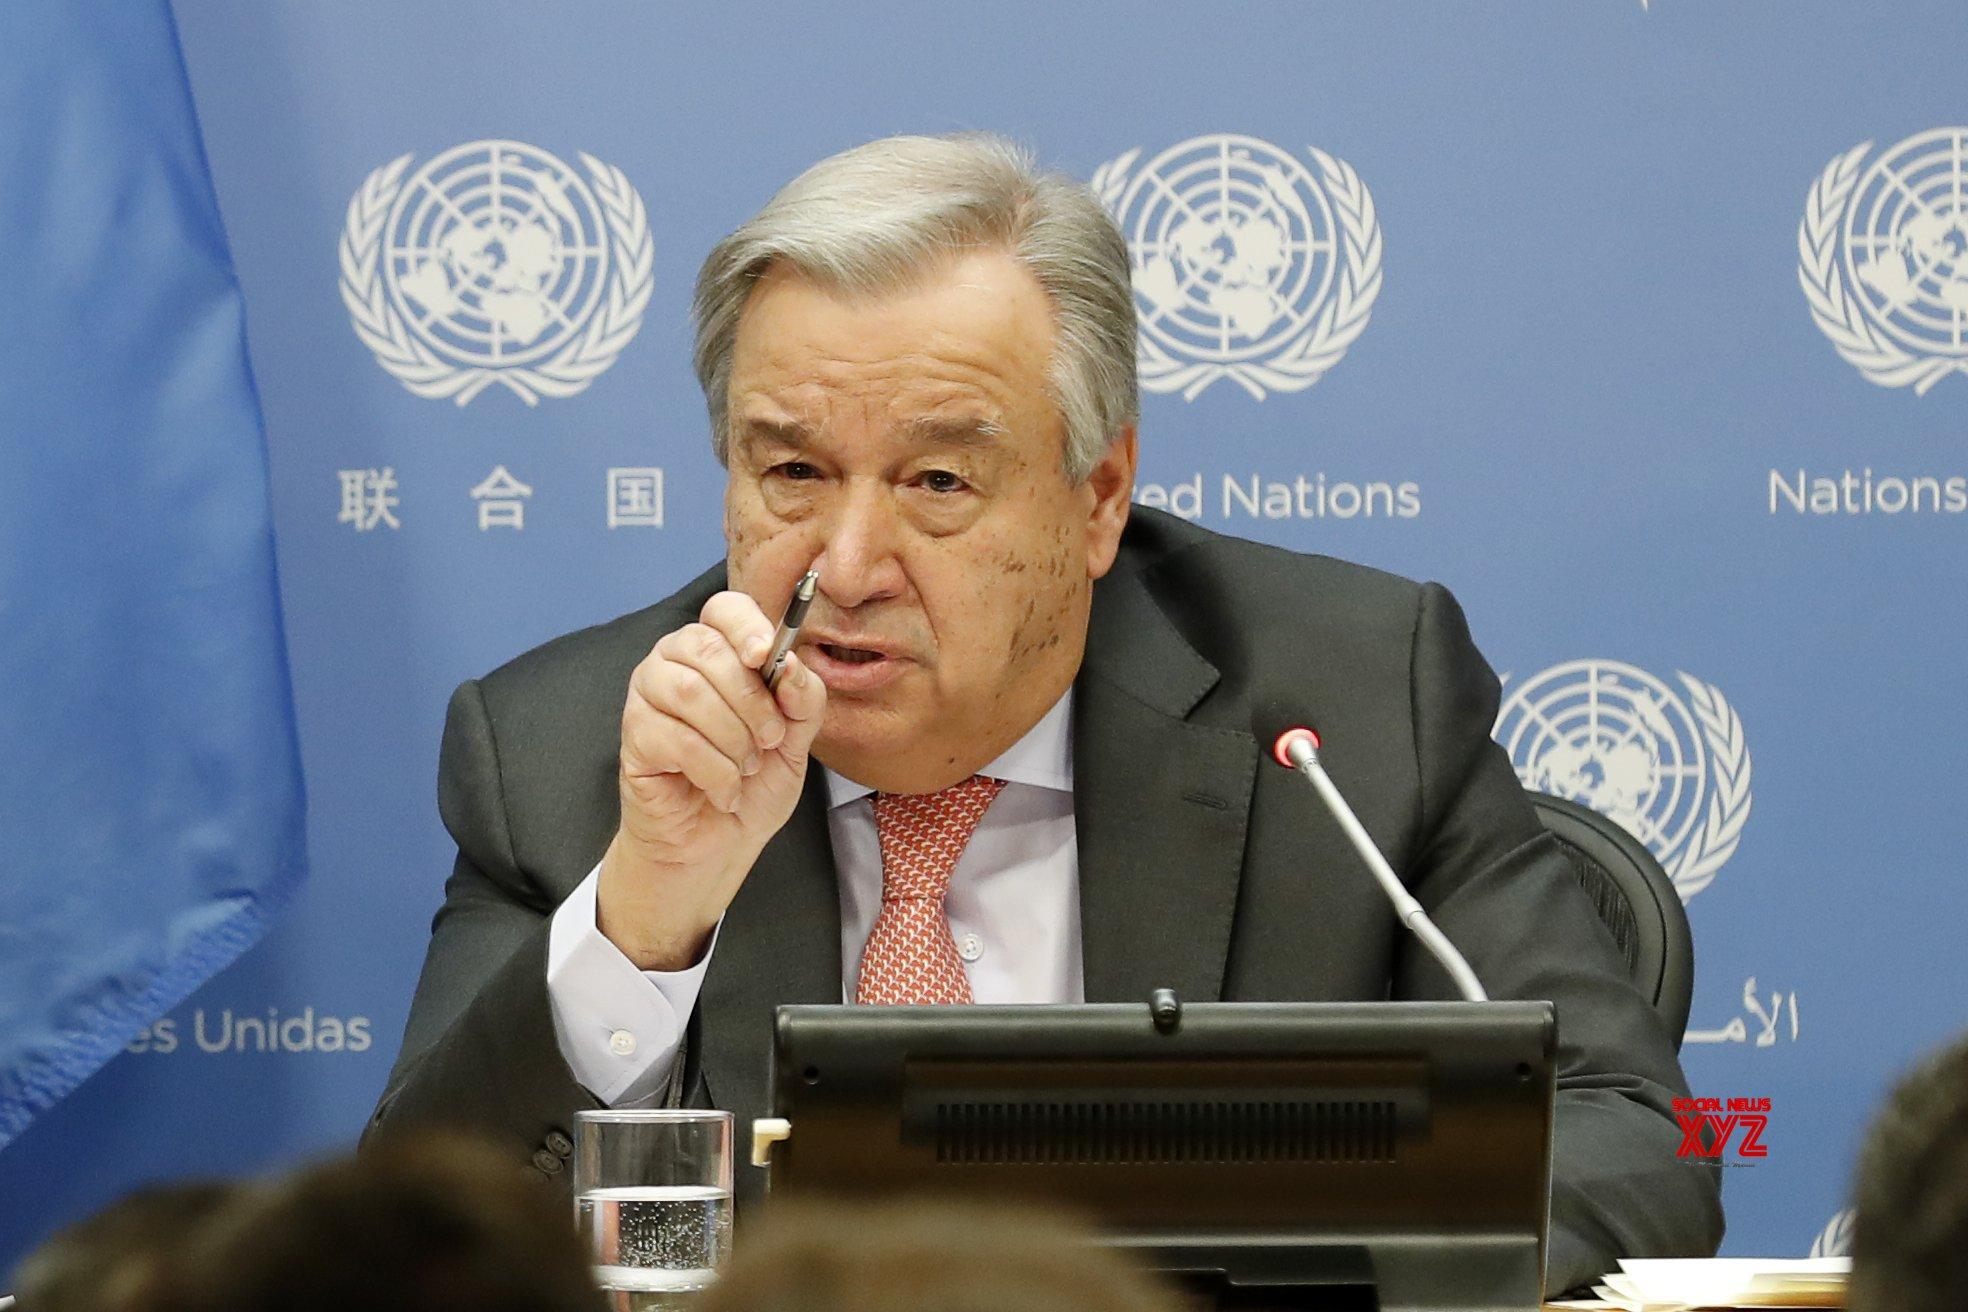 UN chief underscores radio's role in communications